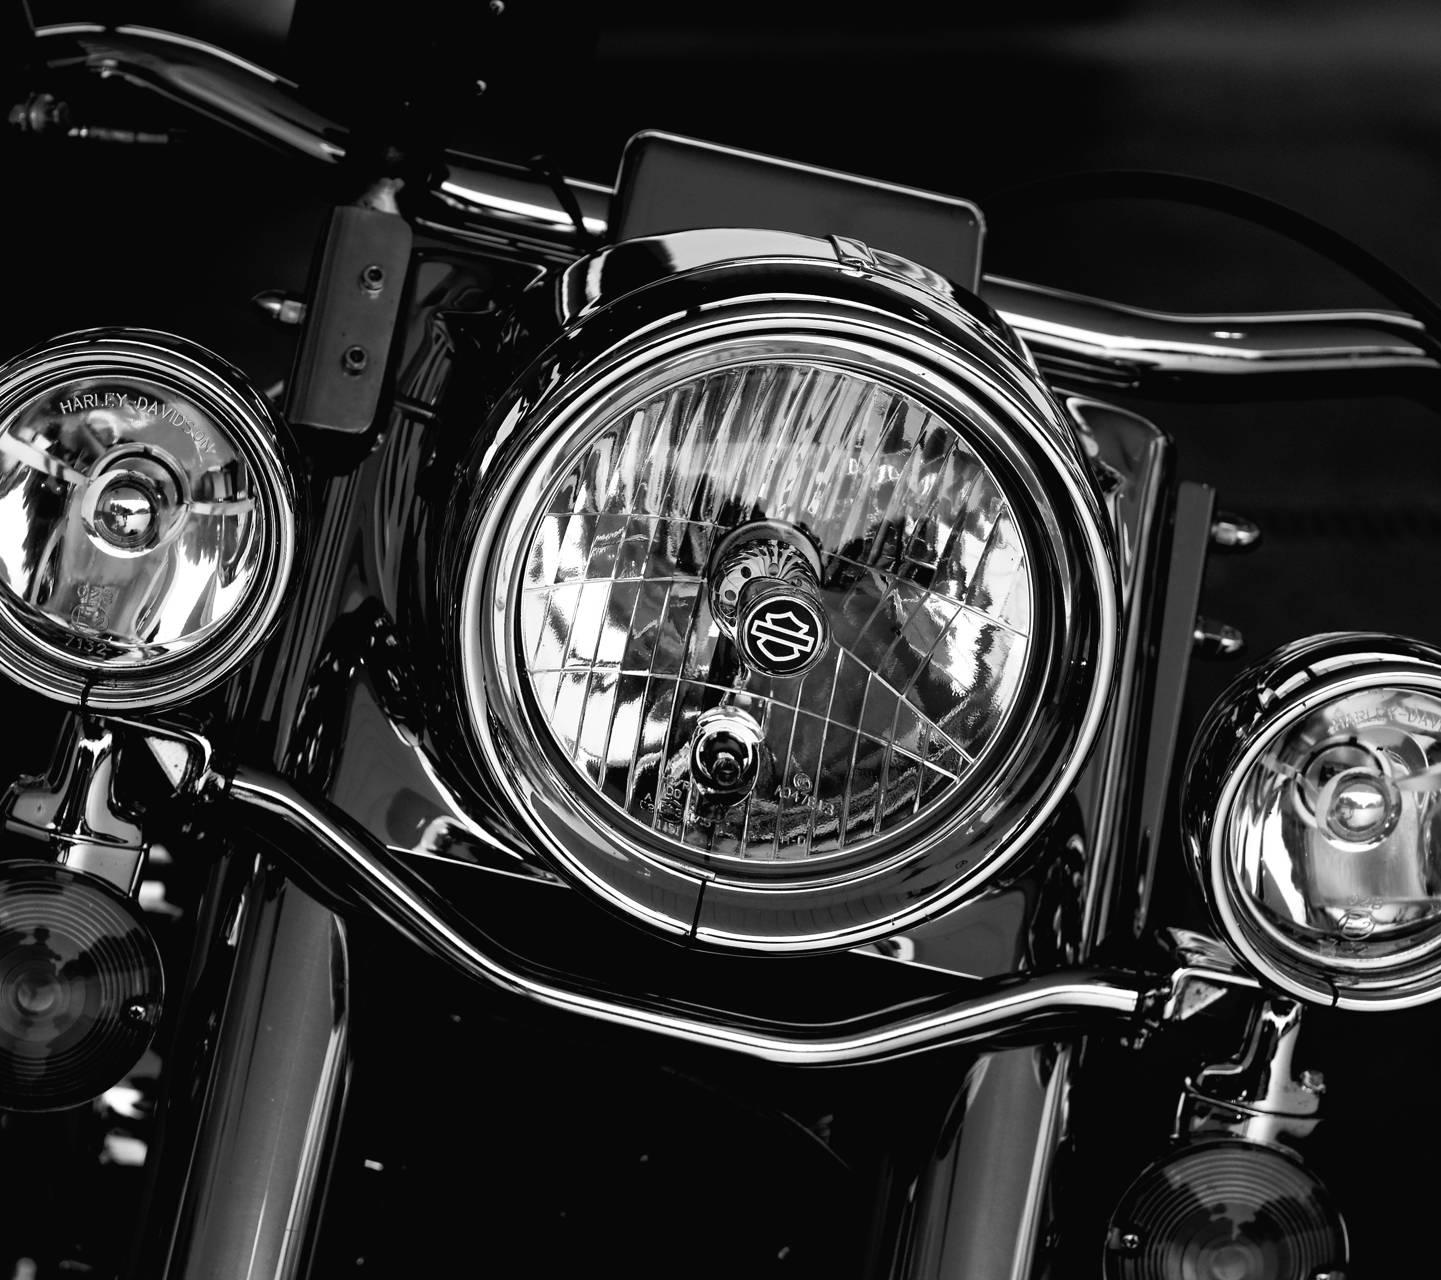 A Harley 2